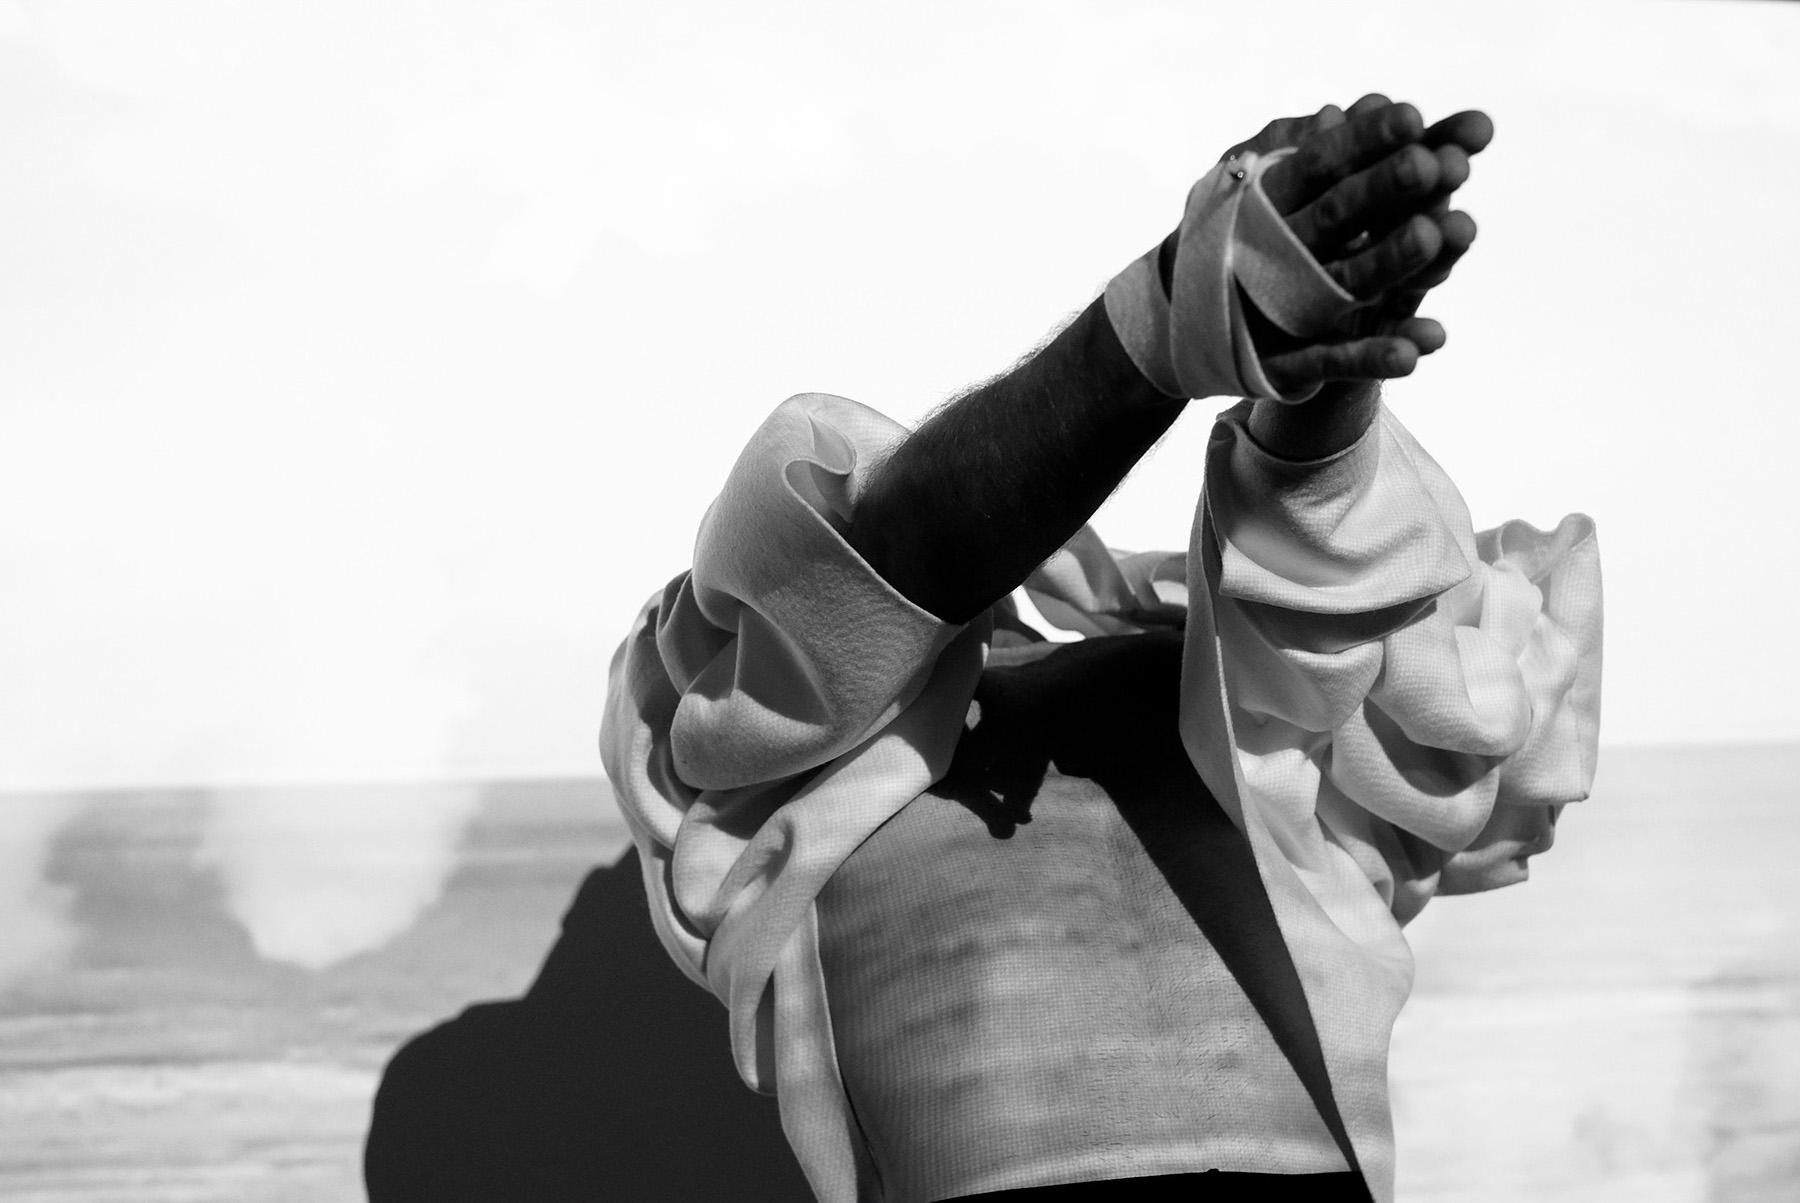 BRUTALIST #7.0 - CLOUD (reversible) : merino wool felt l bonded thread l stainless steel studs  image : Suzanne Phoenix l projection : Zakaria Garmsiri l hmua : Jessi-Leigh O'Halloran l model : James Andrews